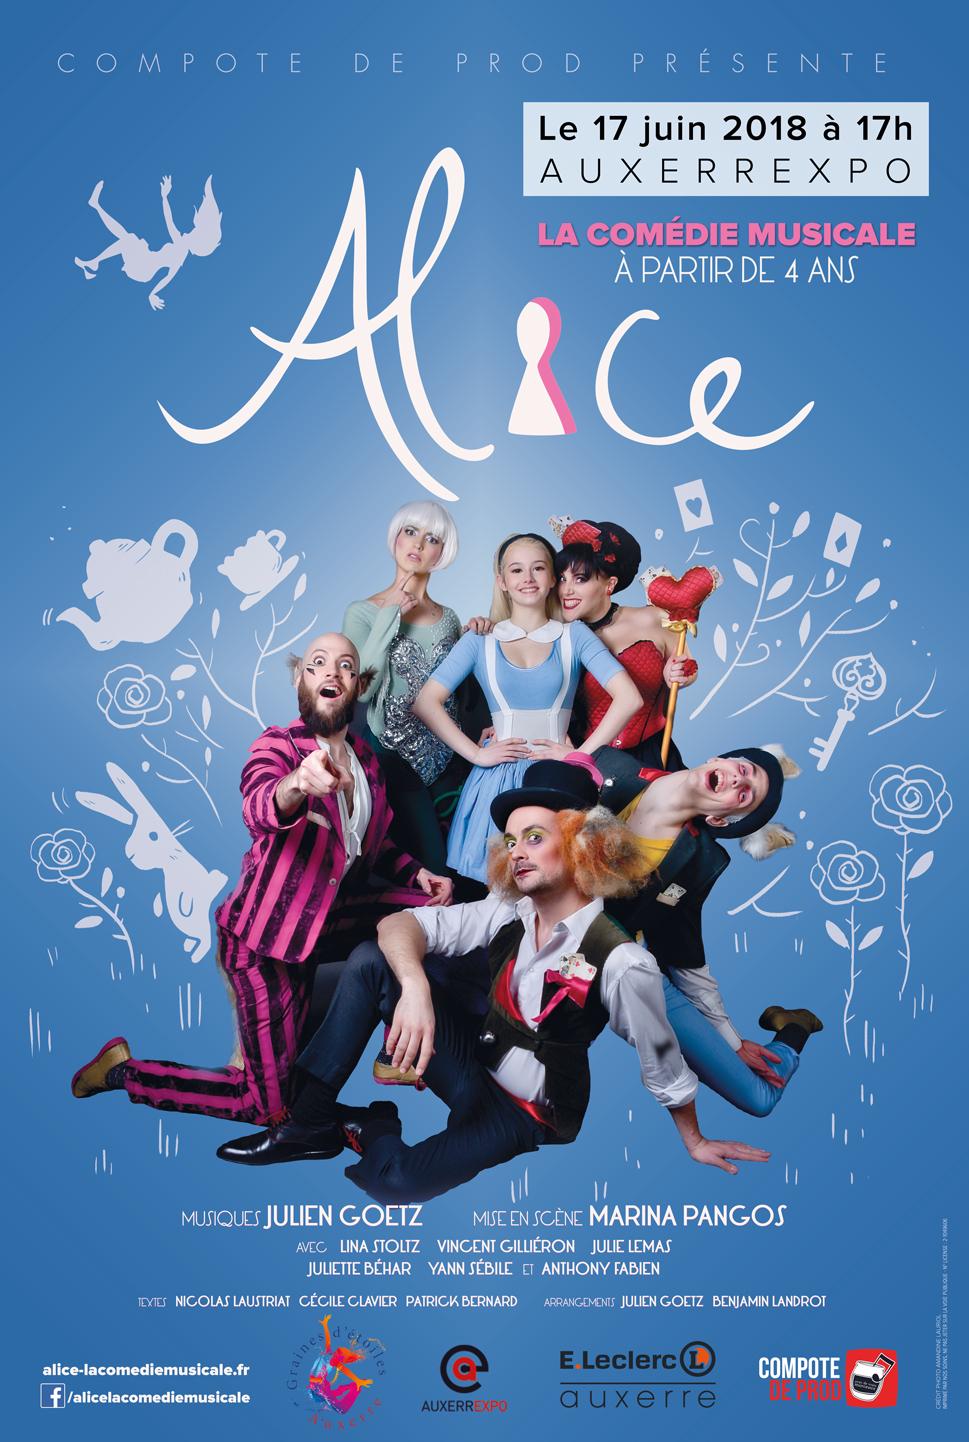 Alice---Tournée-2017---Auxerrexpo